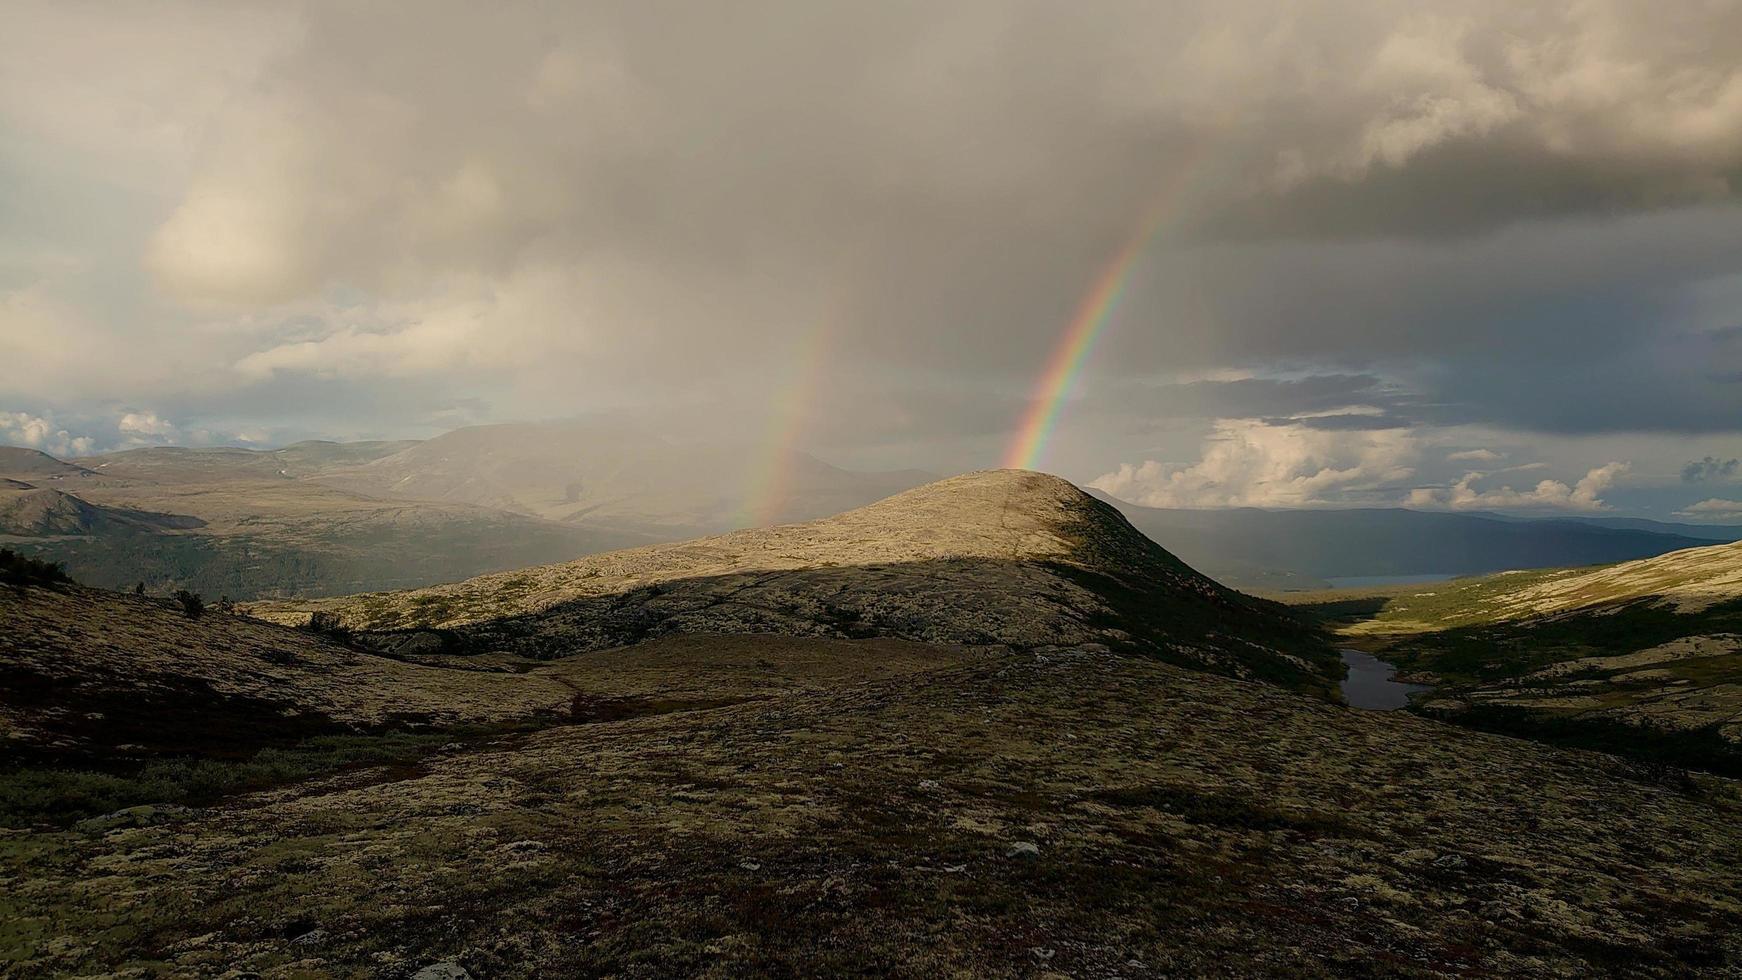 Rainbows over mountains photo